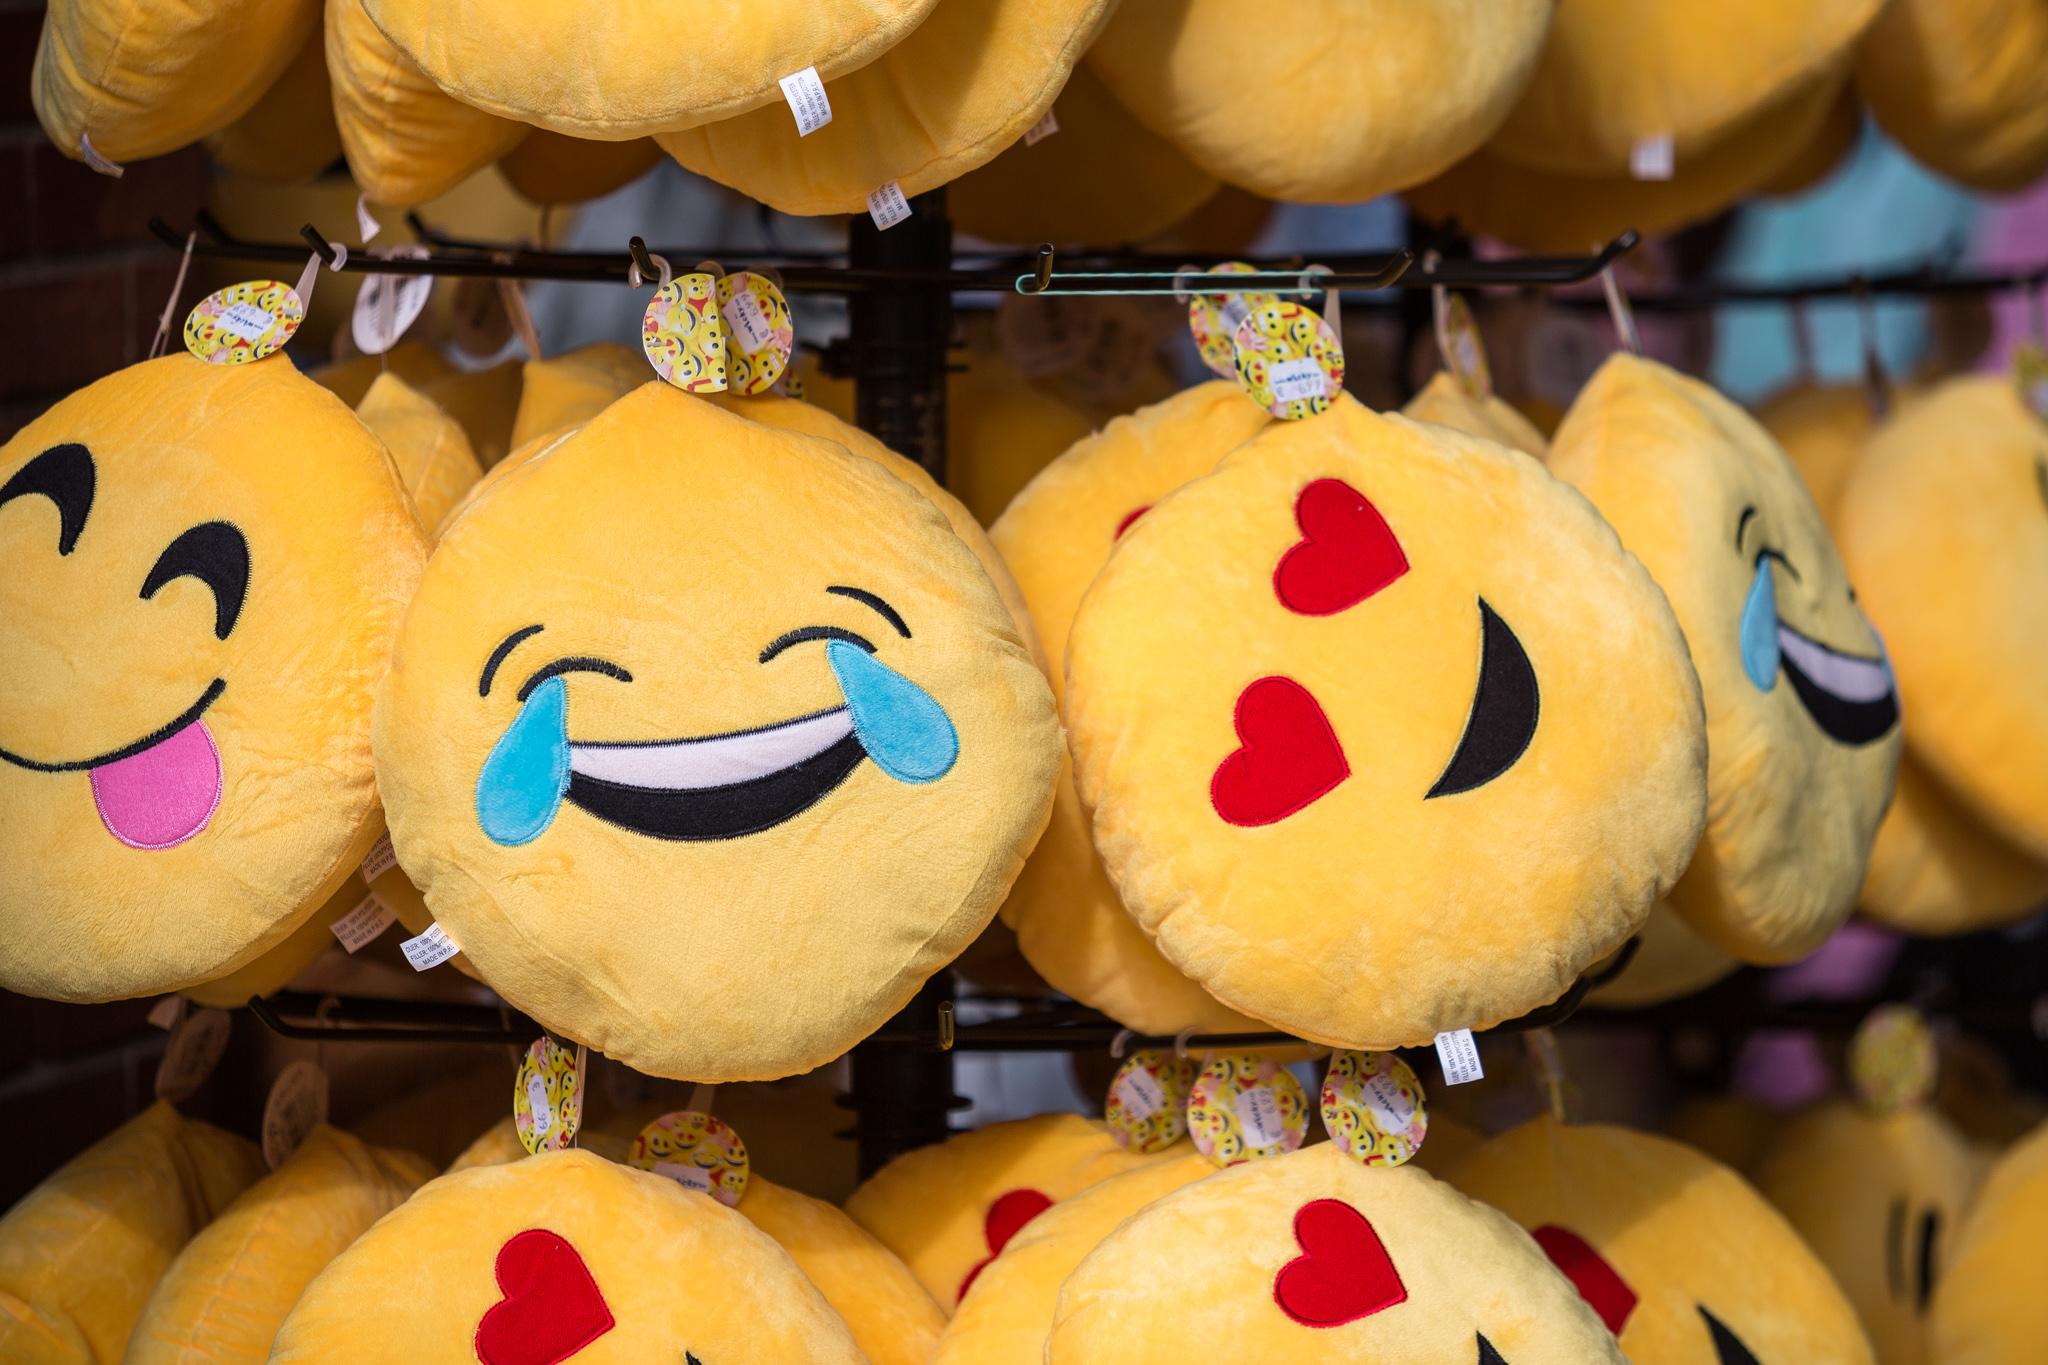 Emoji bible: legit or not legit